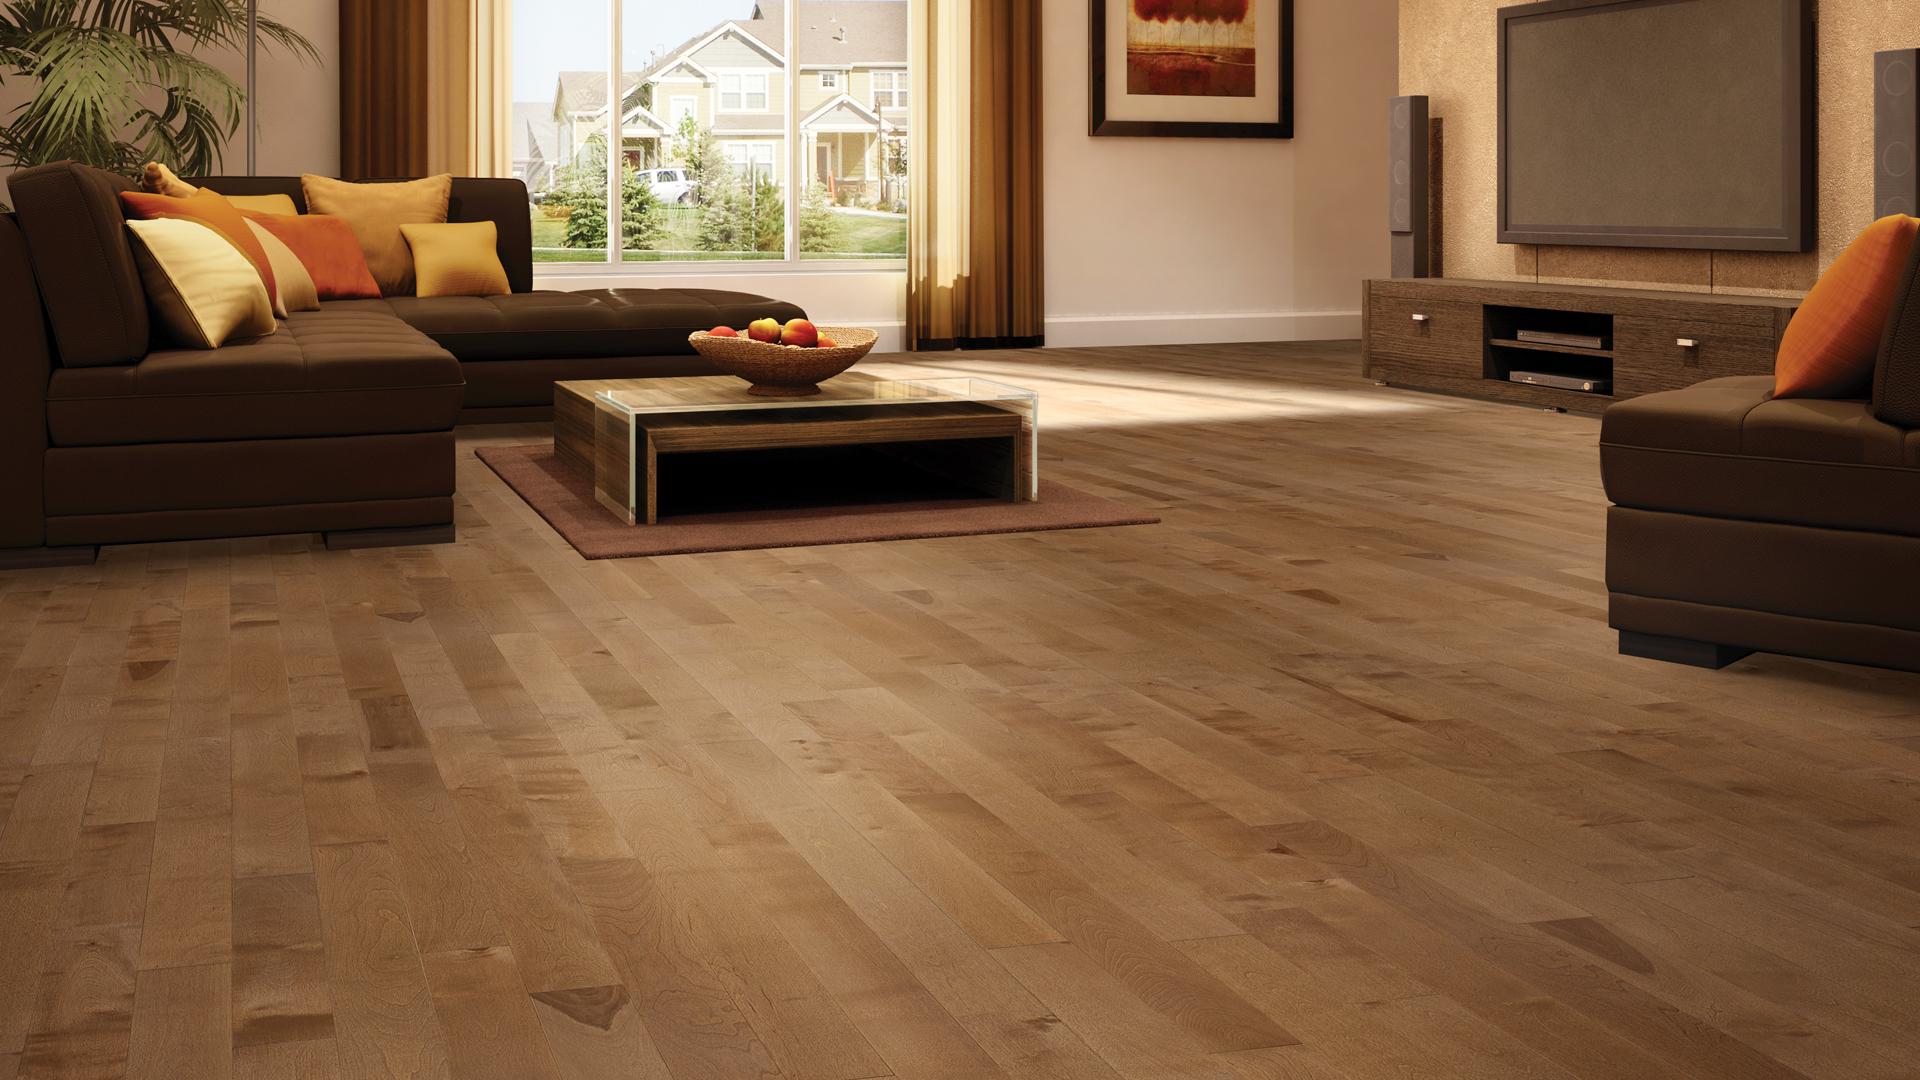 Yellow birch papyrus | Dubeau hardwood floors | Living room decor